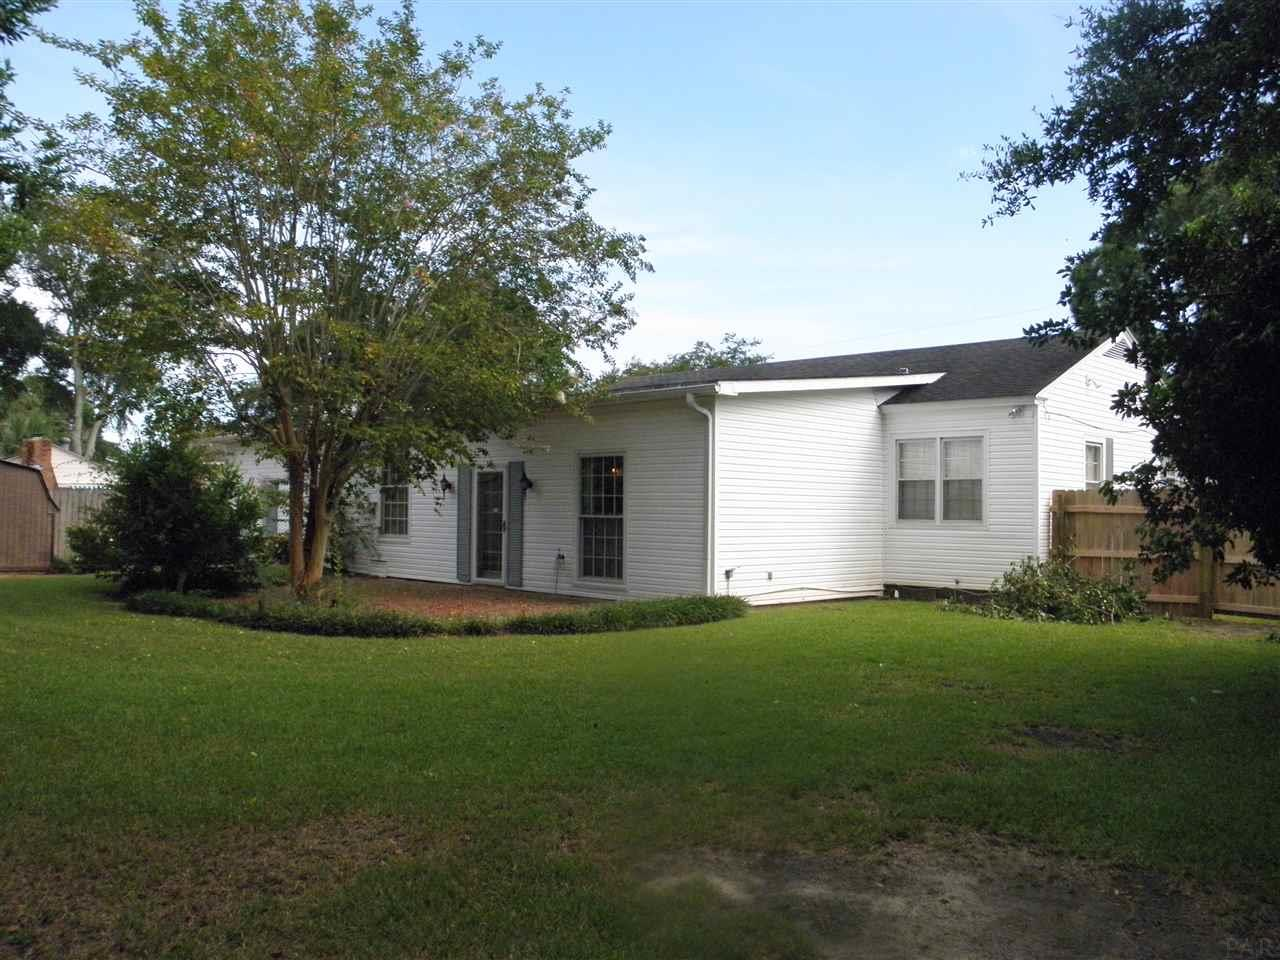 918 Fairway Dr, Pensacola, FL 32507